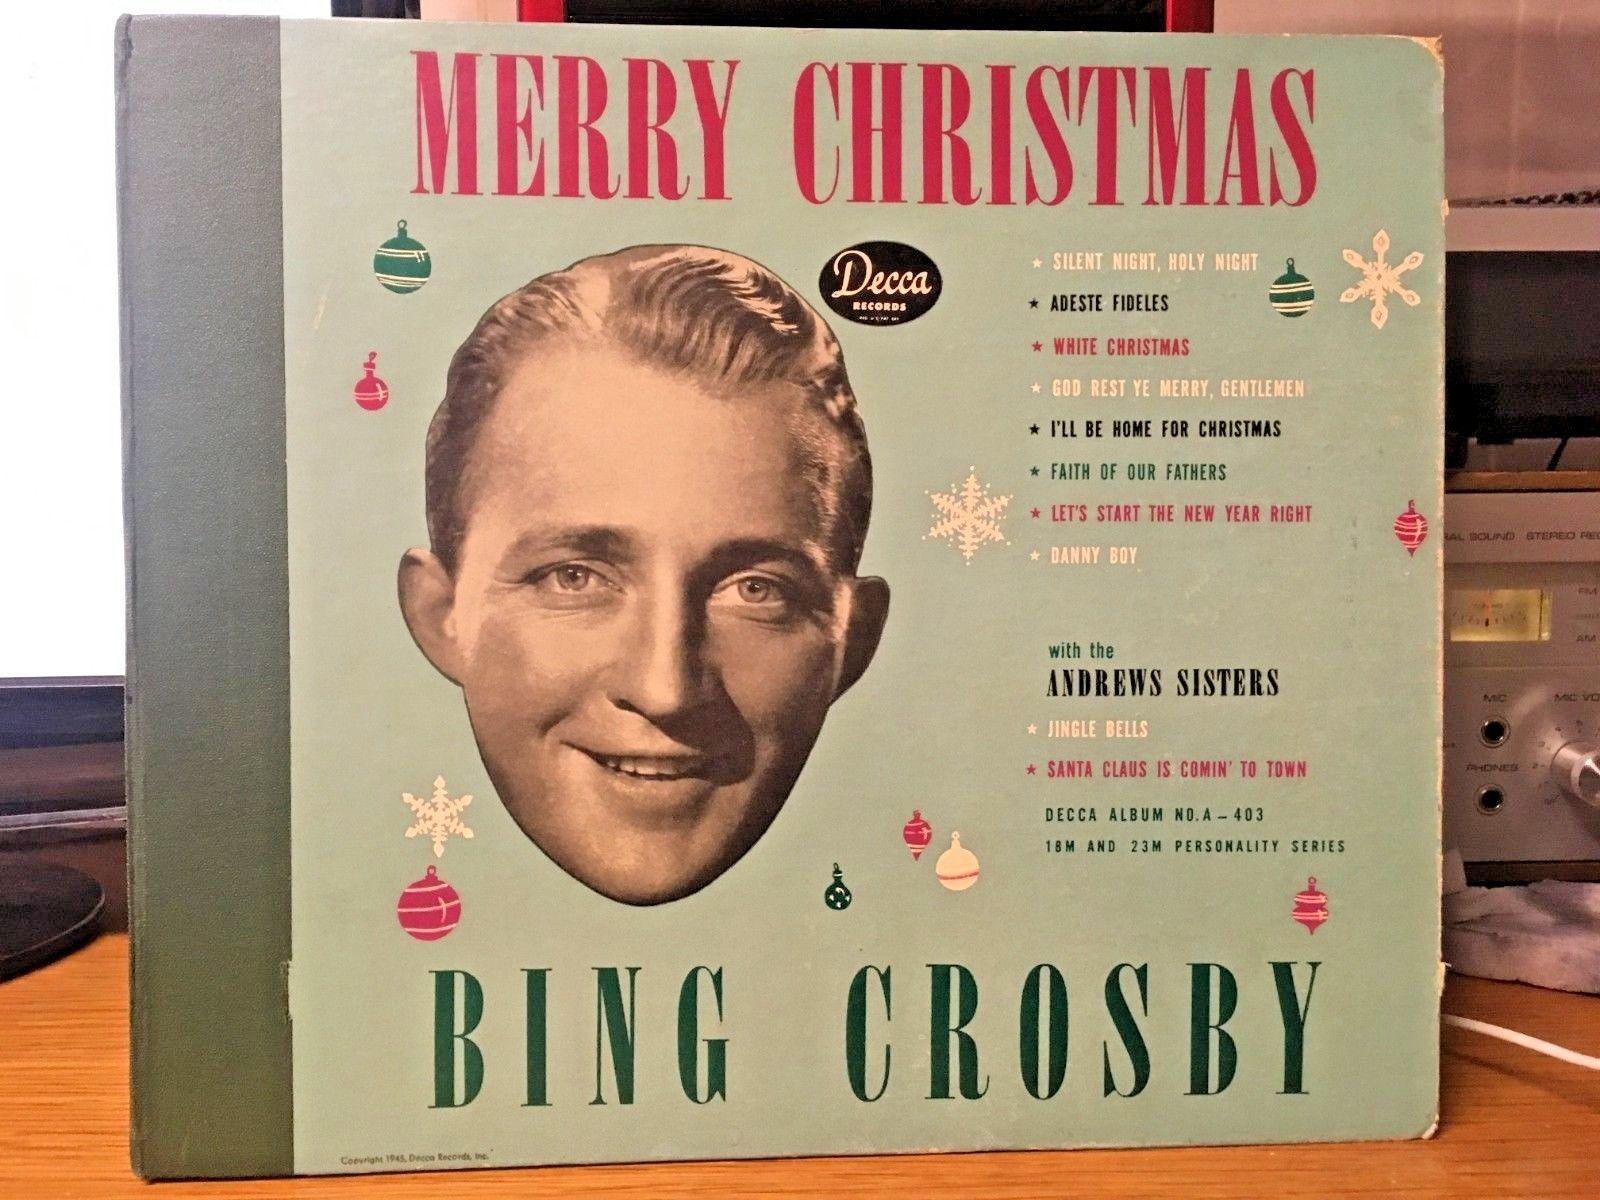 Bing Crosby Merry Christmas.Popsike Com 78 Rpm Christmas Set Bing Crosby Merry